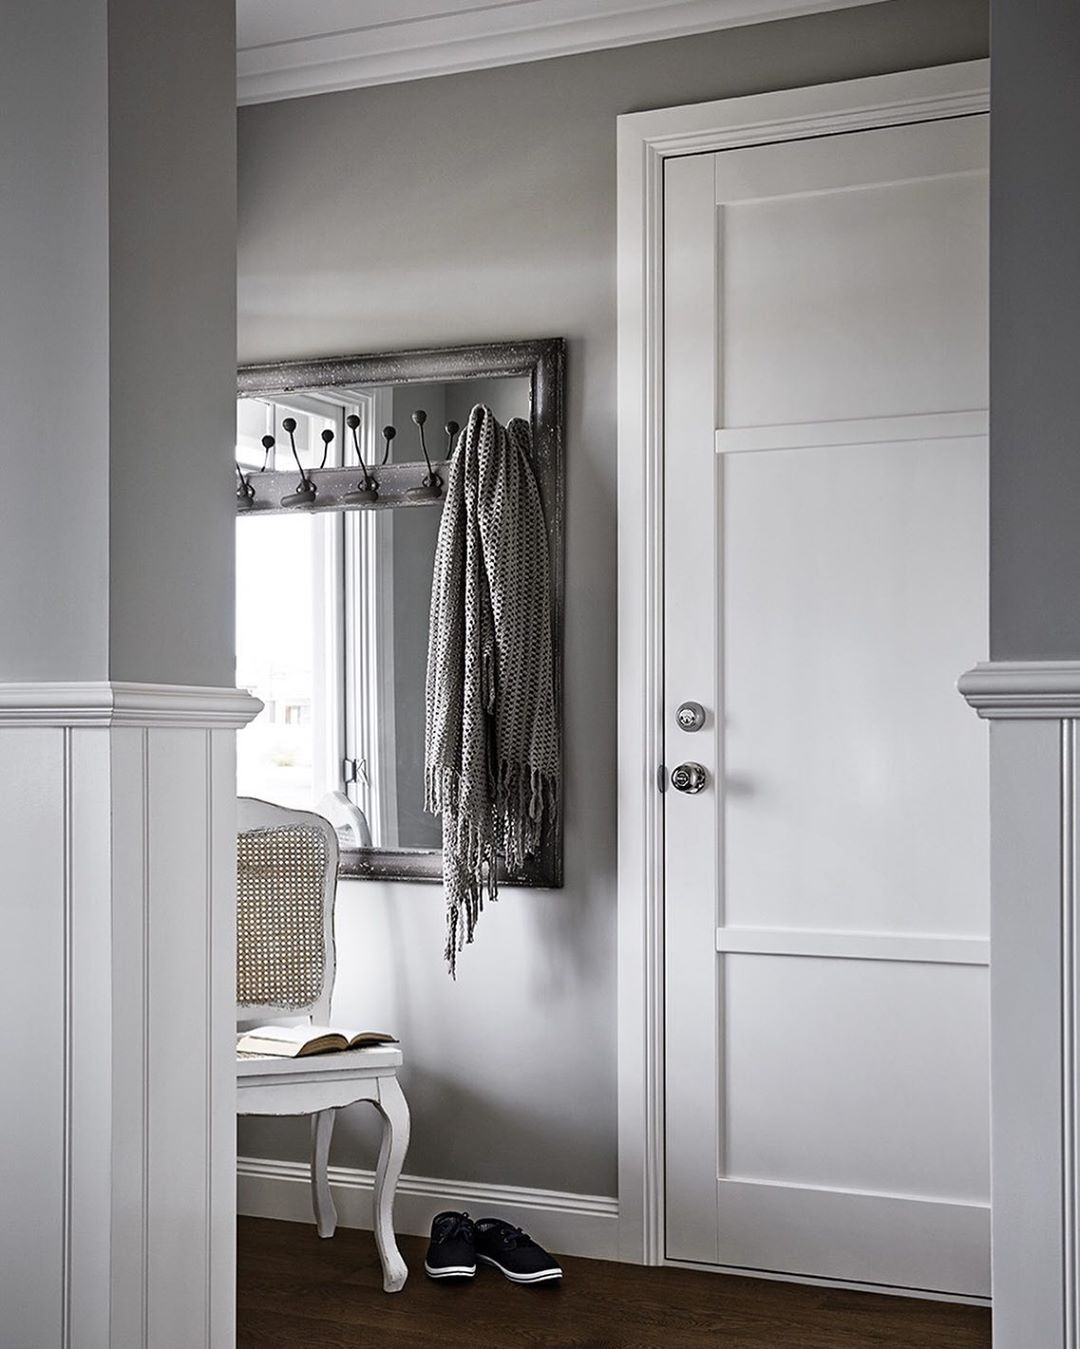 Corinthian Doors On Instagram Are Your Doors In Need Of A Refresh But You Don T Know Where To Start Corinthi Internal Doors Door Installation Doors Interior